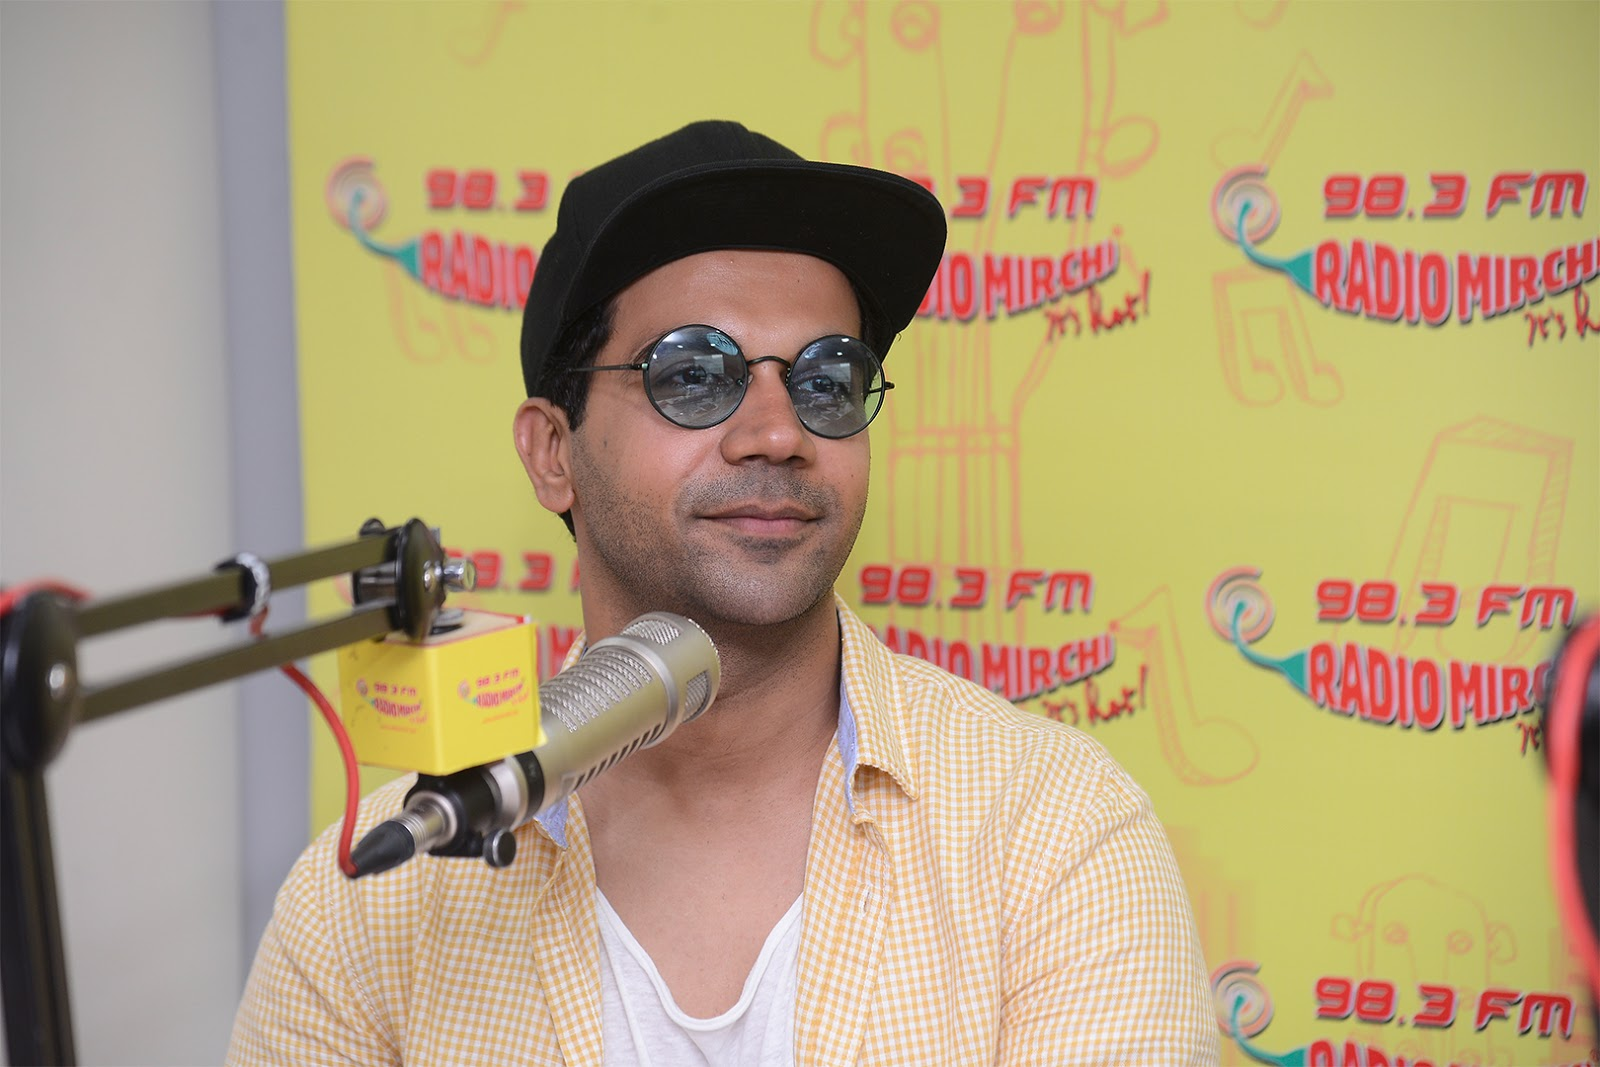 Bareilly Ki Barfi Starcast Kriti Sanon Promoting Movie at Radio Mirchi Studio